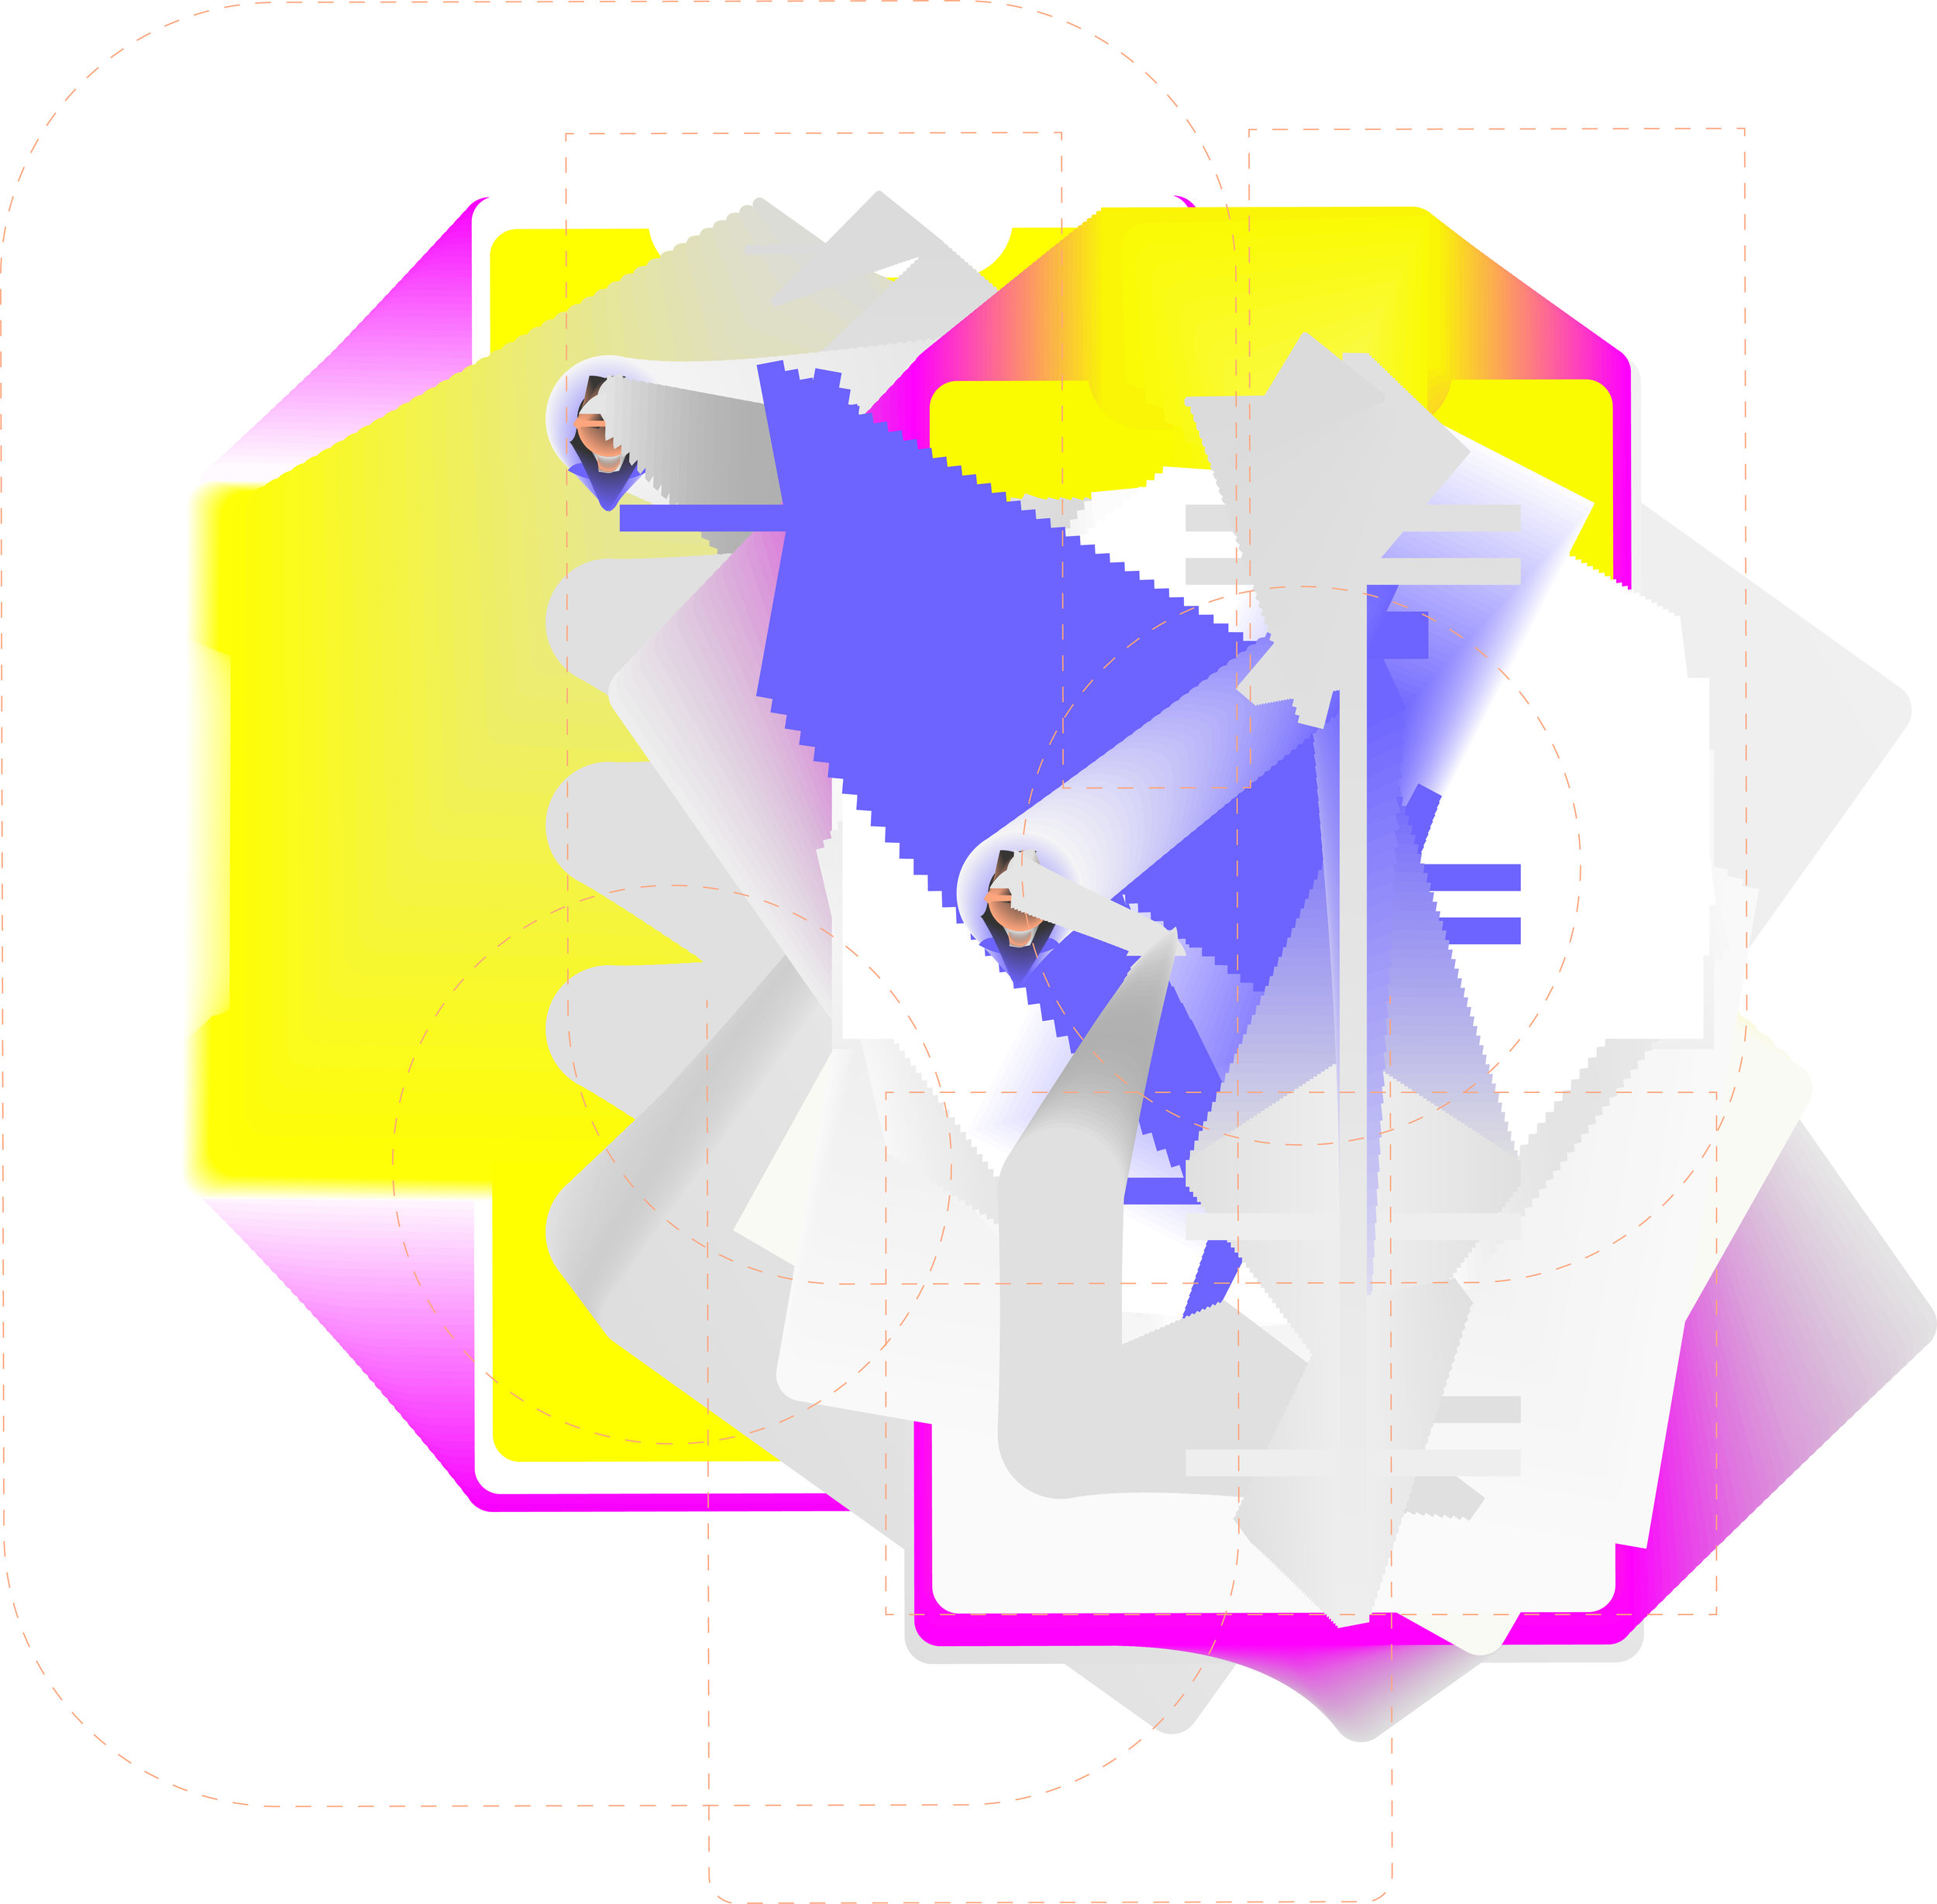 Design Futures    : Open Source Design     By Calvin Hutcheon